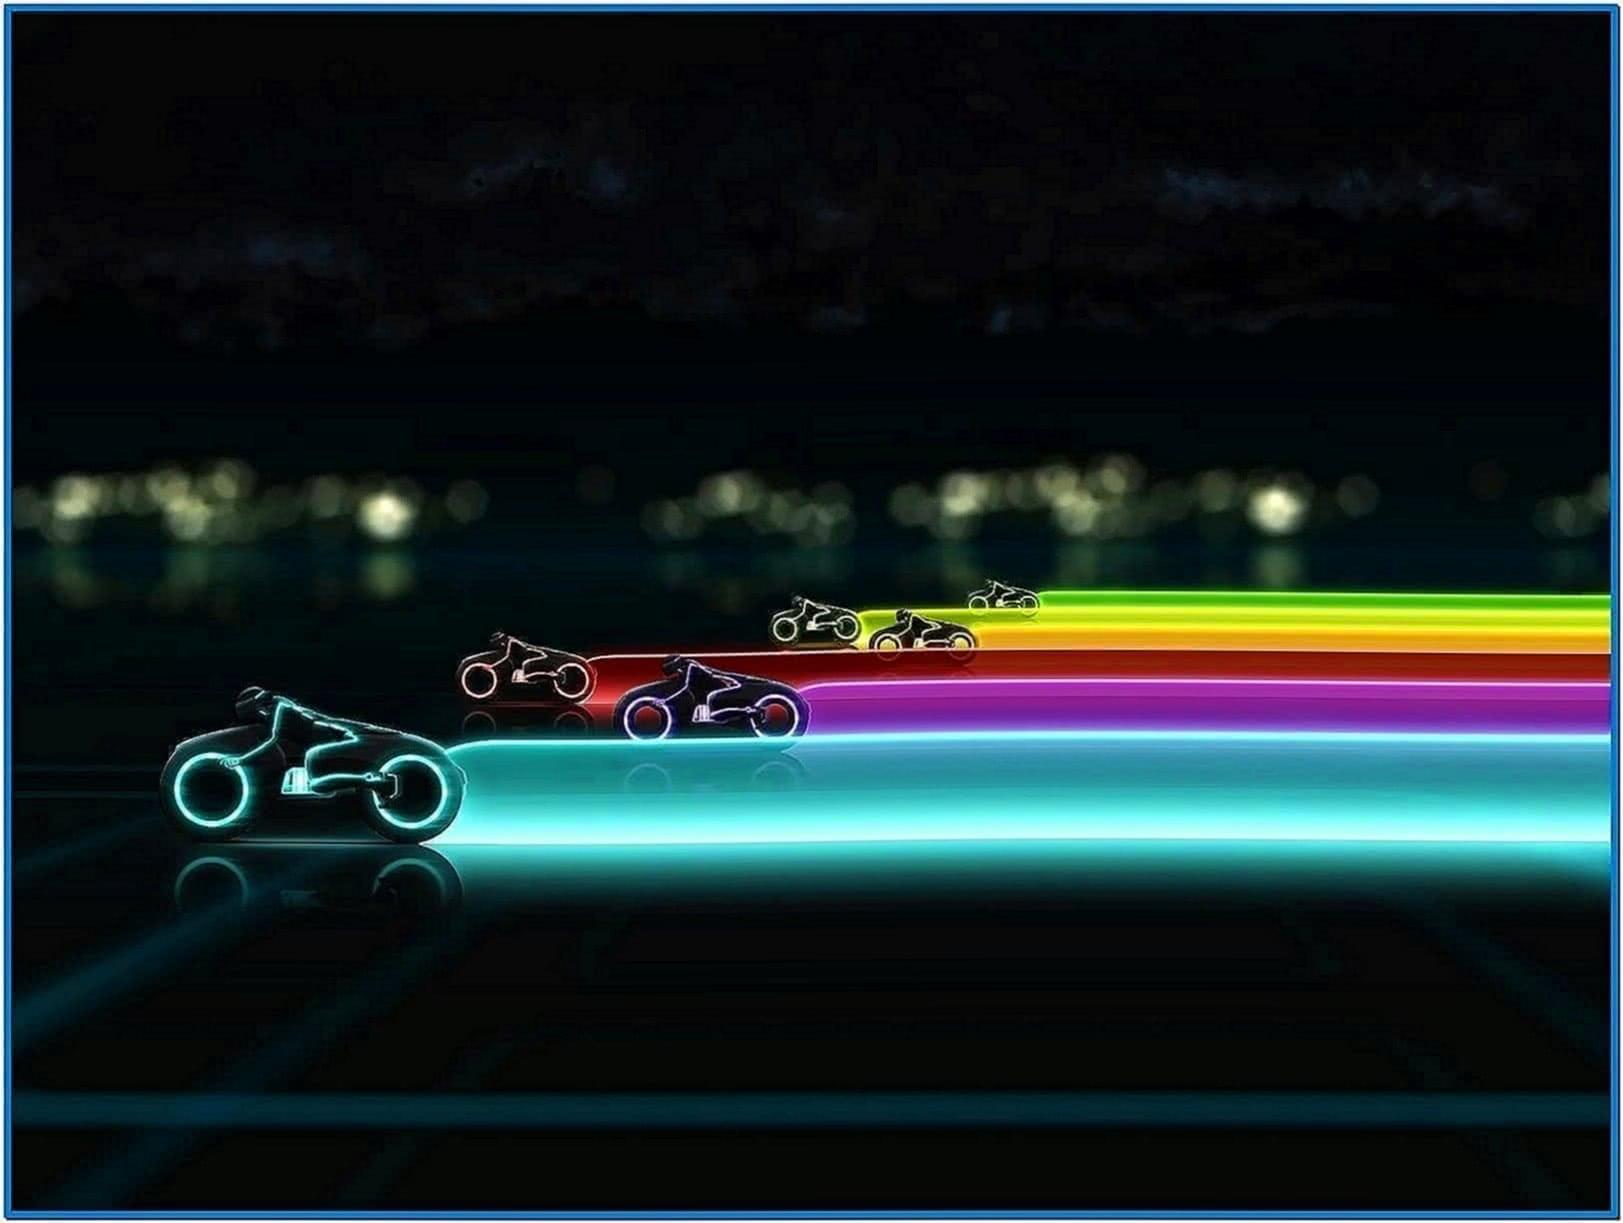 Tron legacy light cycle screensaver